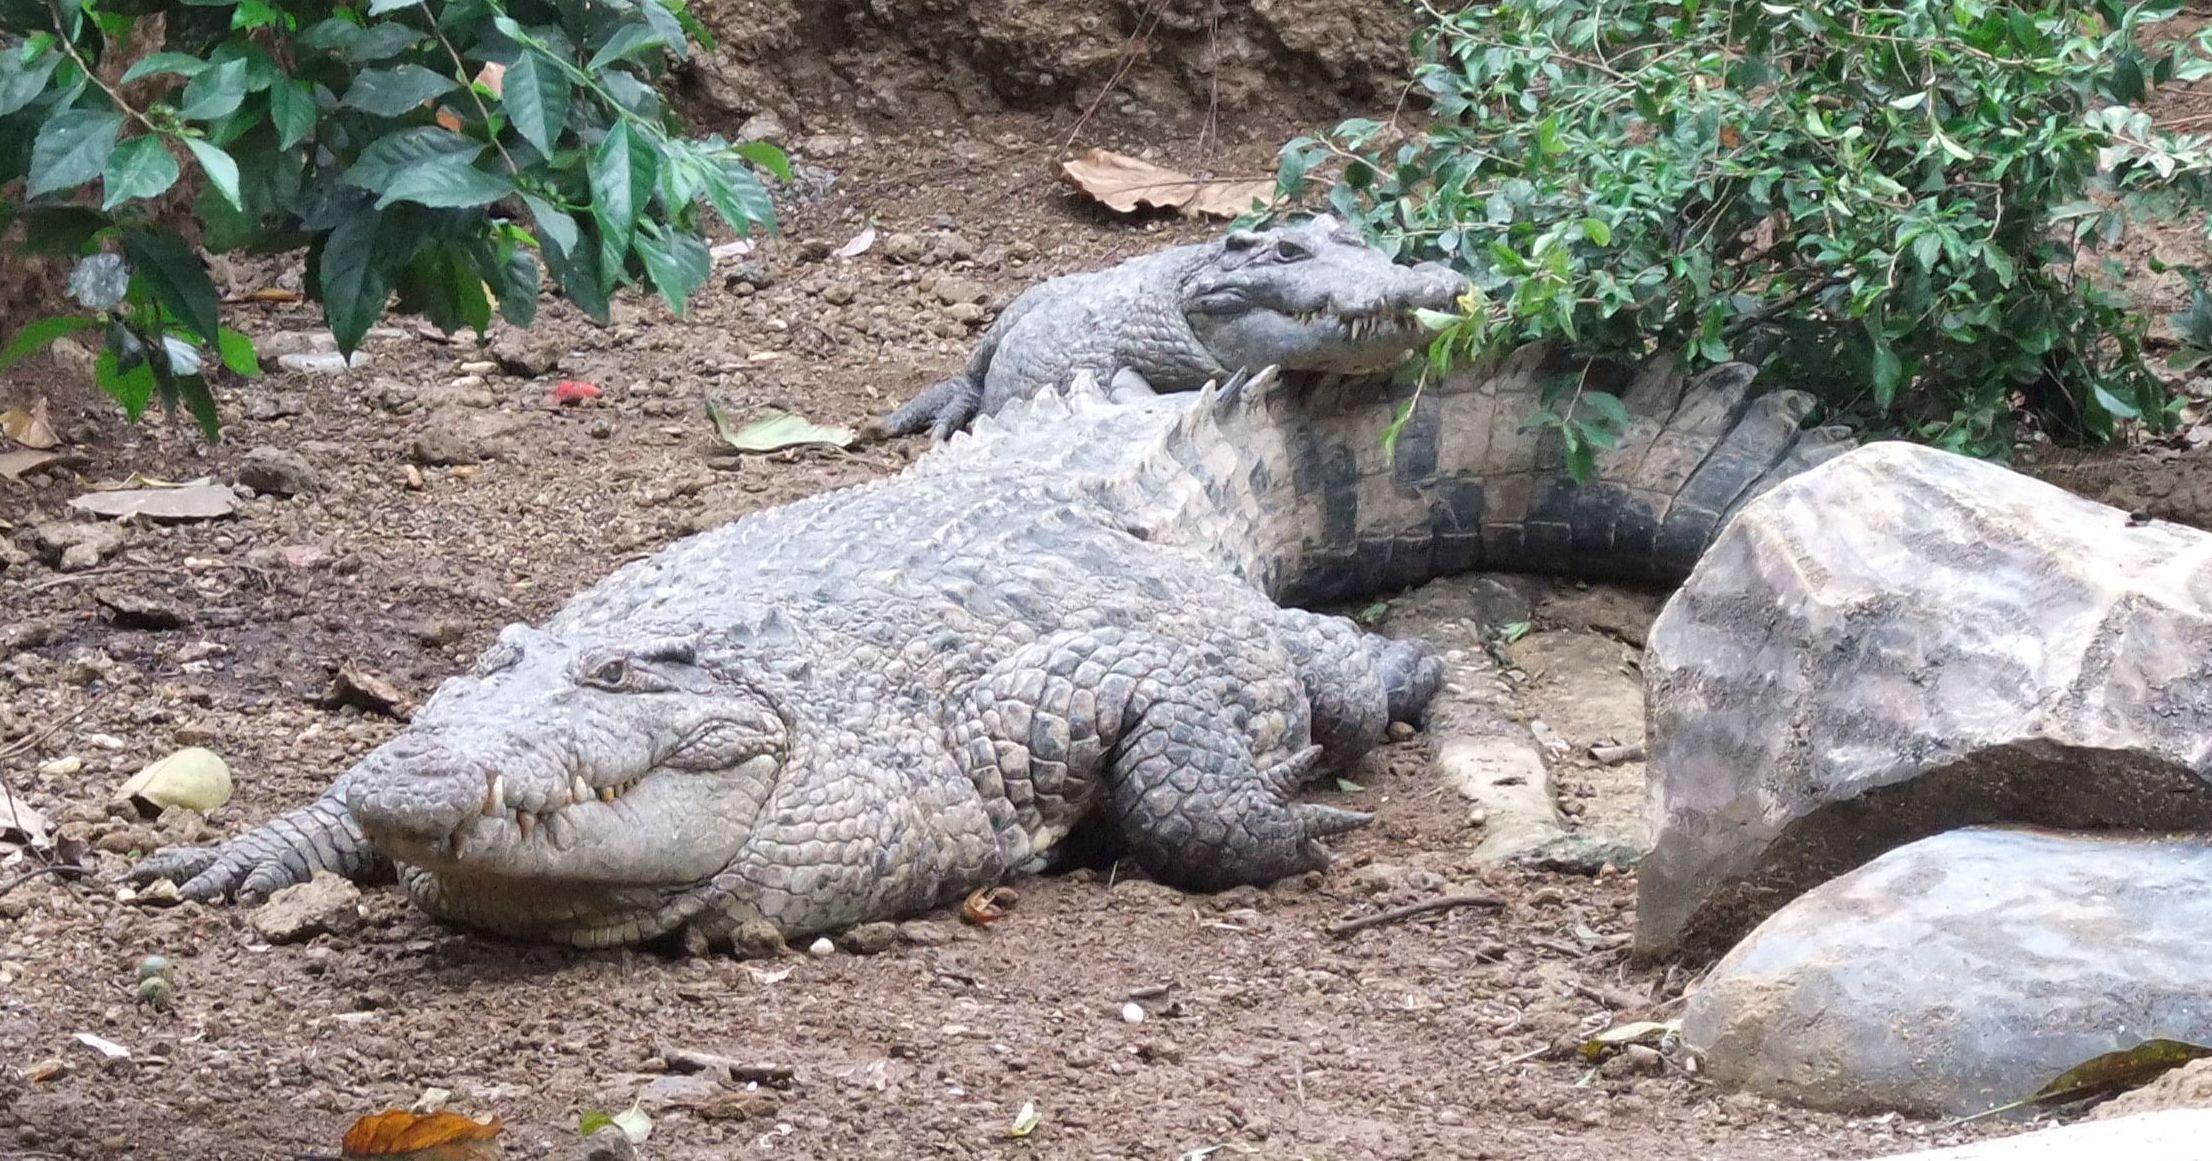 Buaya_Irian_Crocodylus_novaeguineae_Bandung_Zoo.JPG (2966×1834)